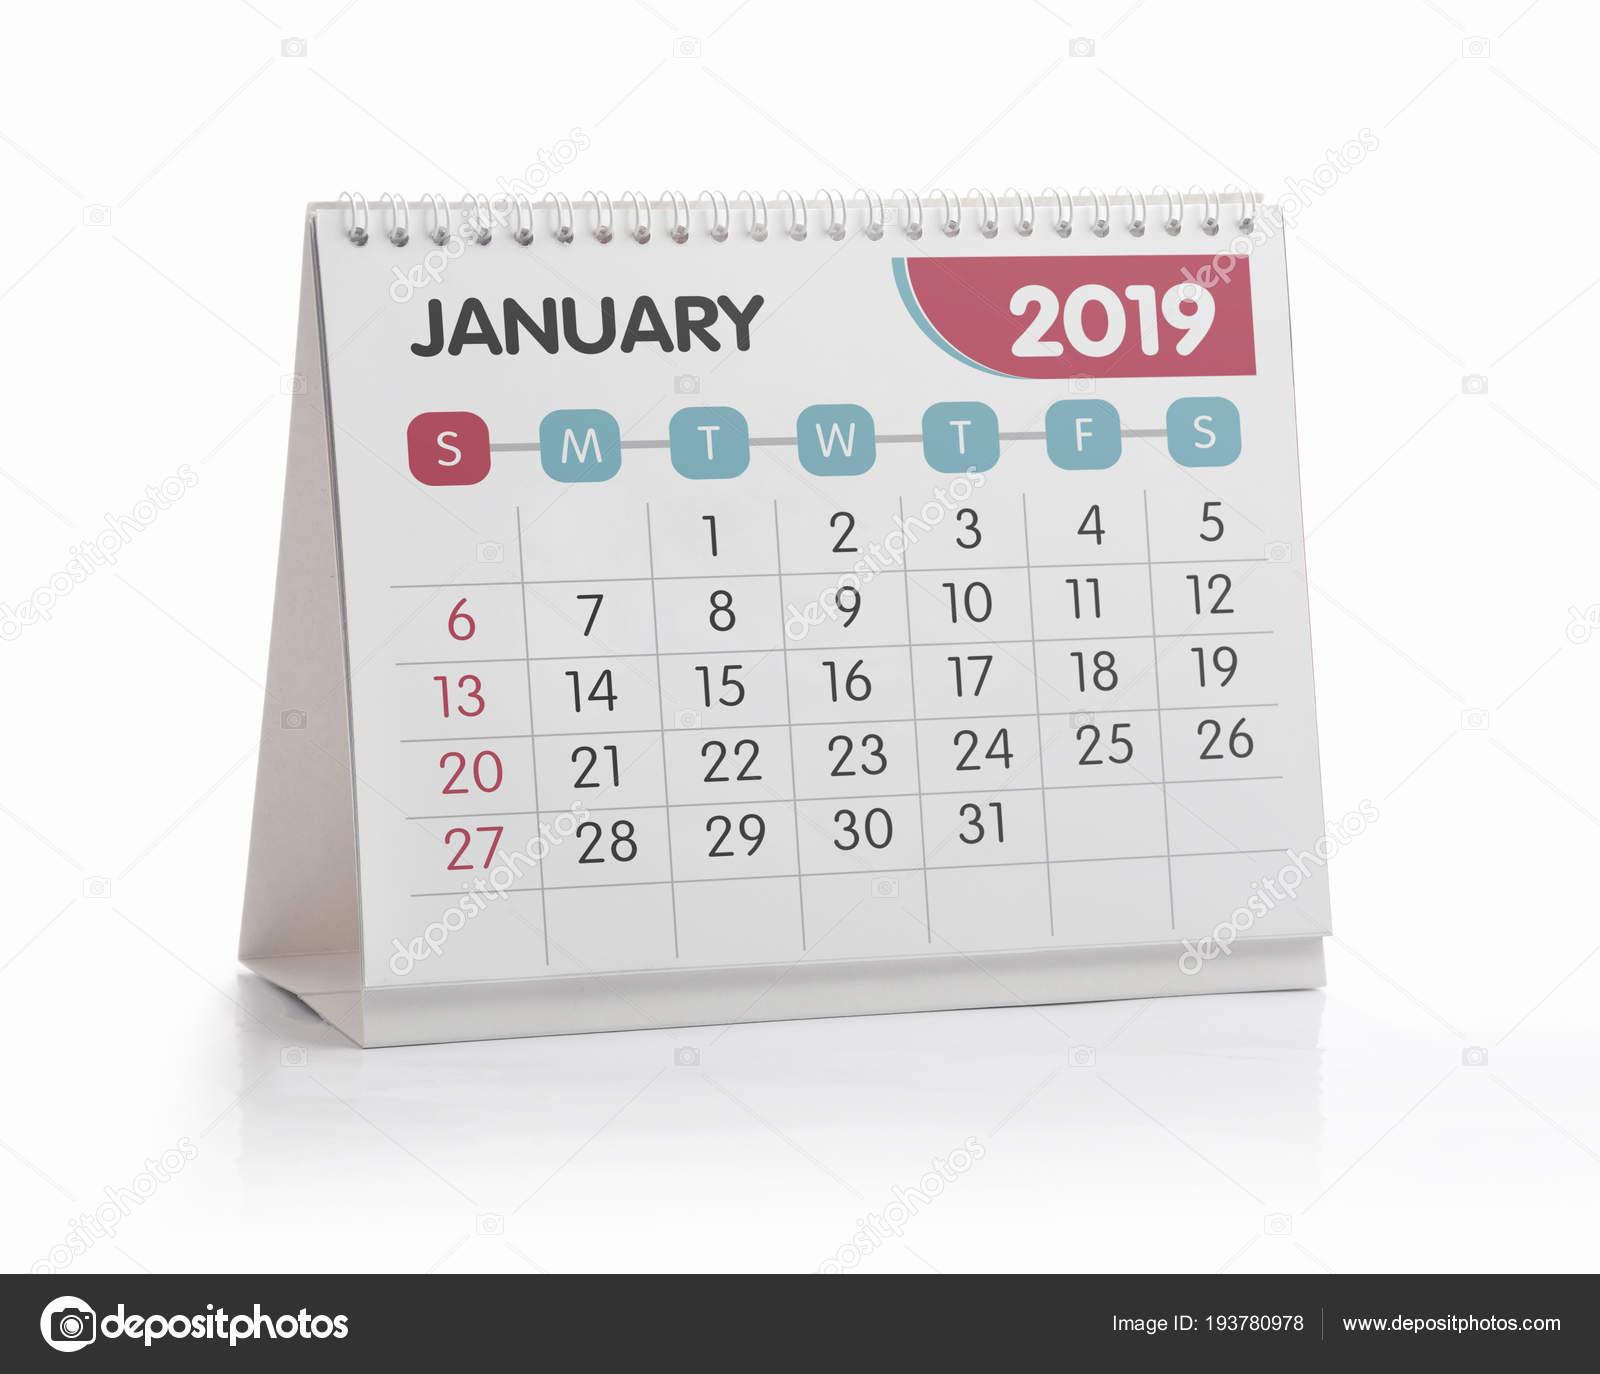 office naptár sablon 2019 Office naptár január 2019 — Stock Fotó © MidoSemsem #193780978 office naptár sablon 2019